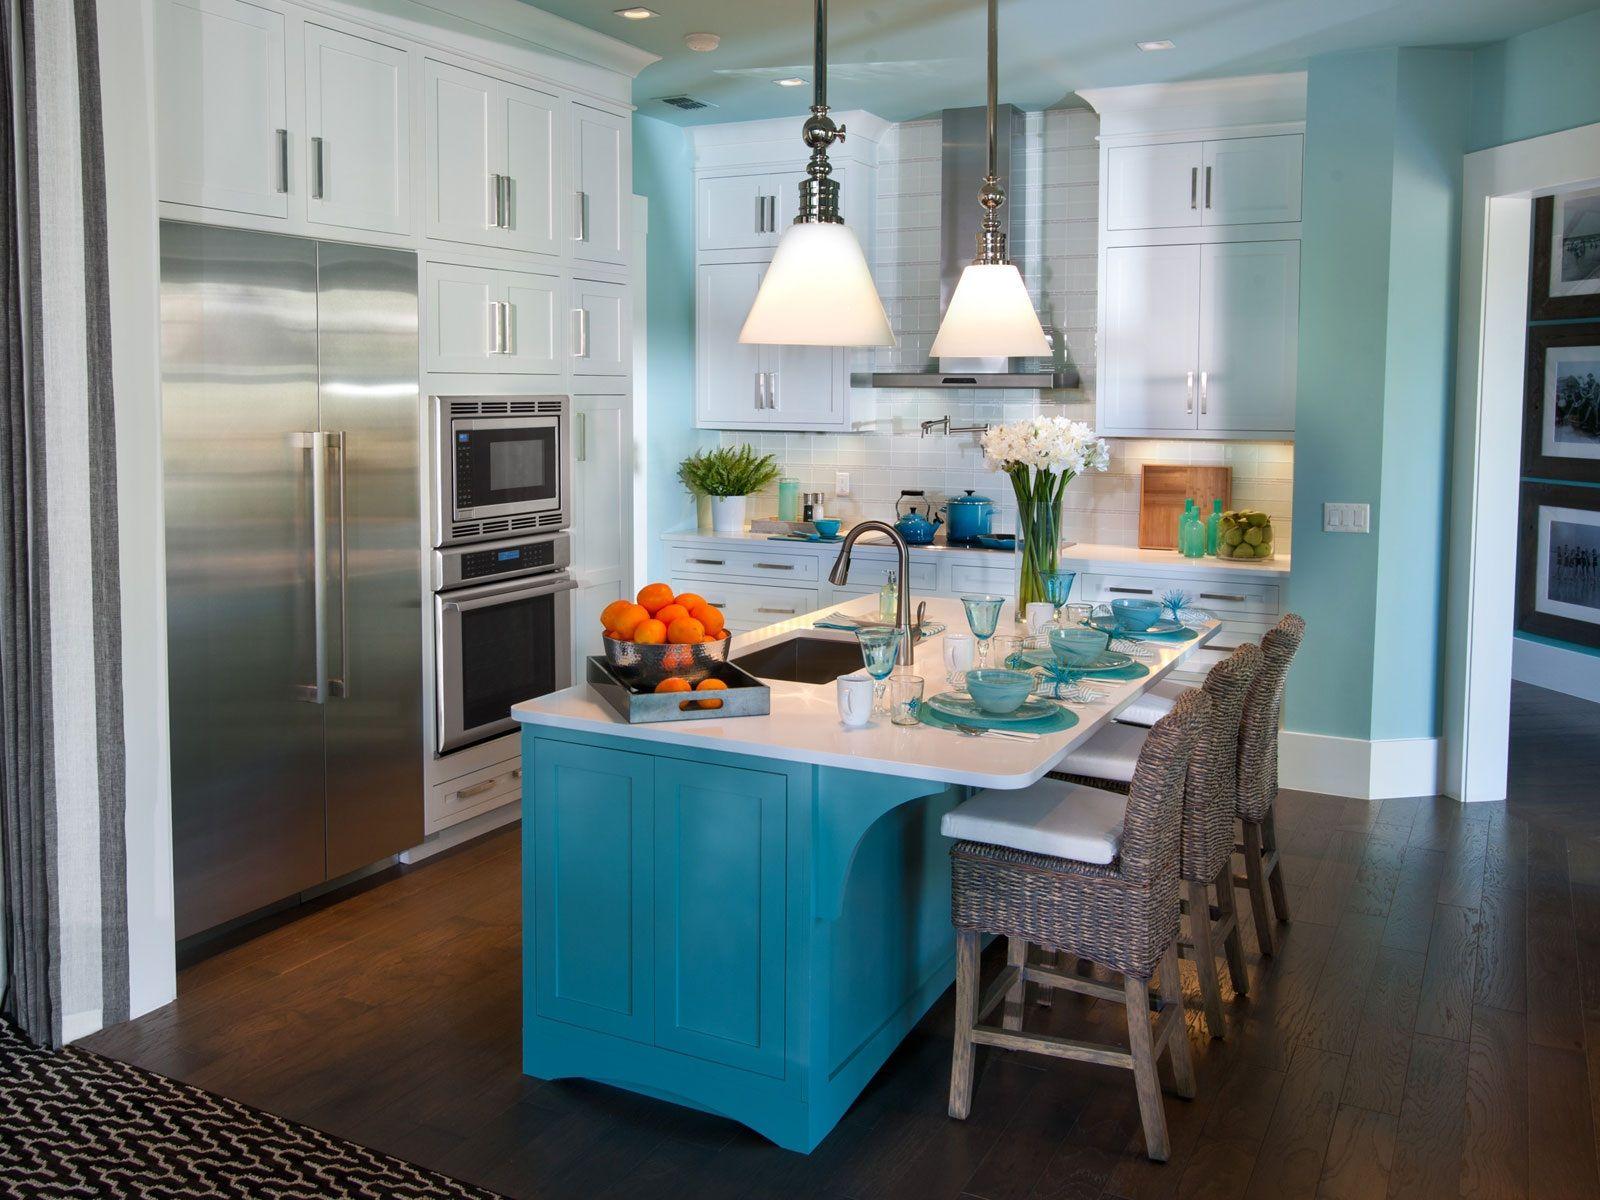 Amazing Kitchen Decor Ideas | Kitchen | Pinterest | Kitchen decor ...